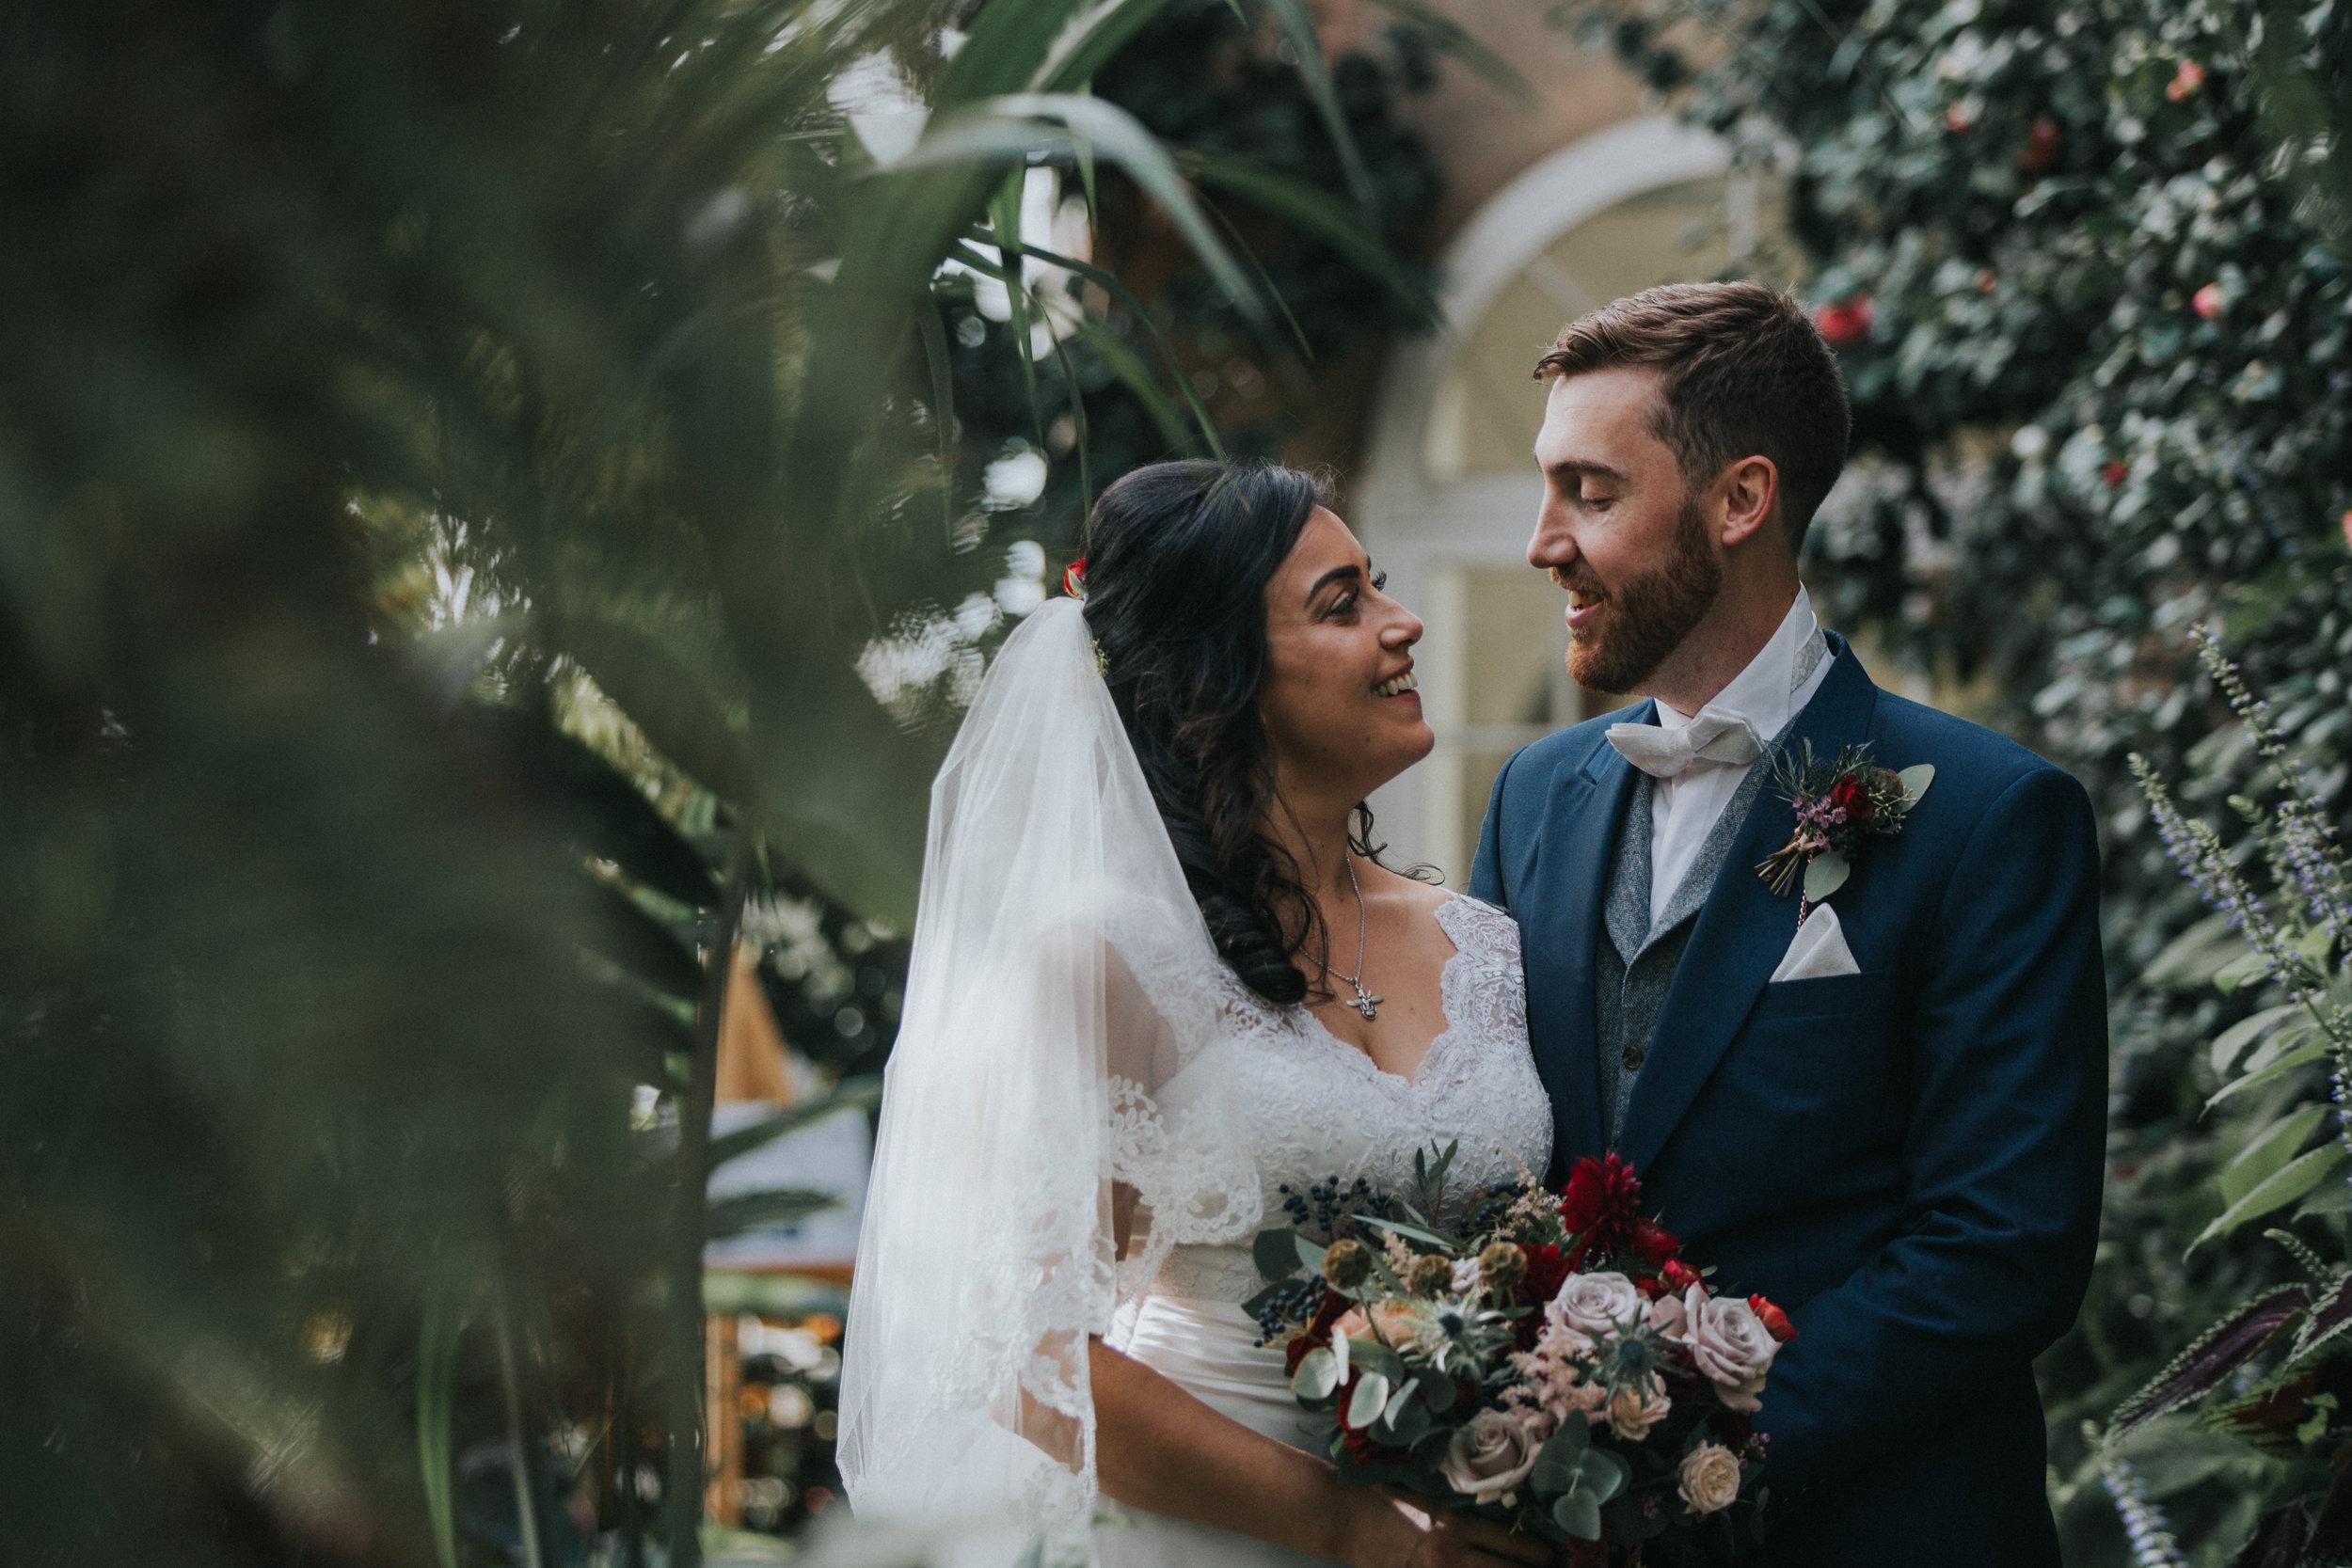 london-bedfordshire-uk-wedding-photography-woburn-sculpture-gallery-bridal-portrait-52